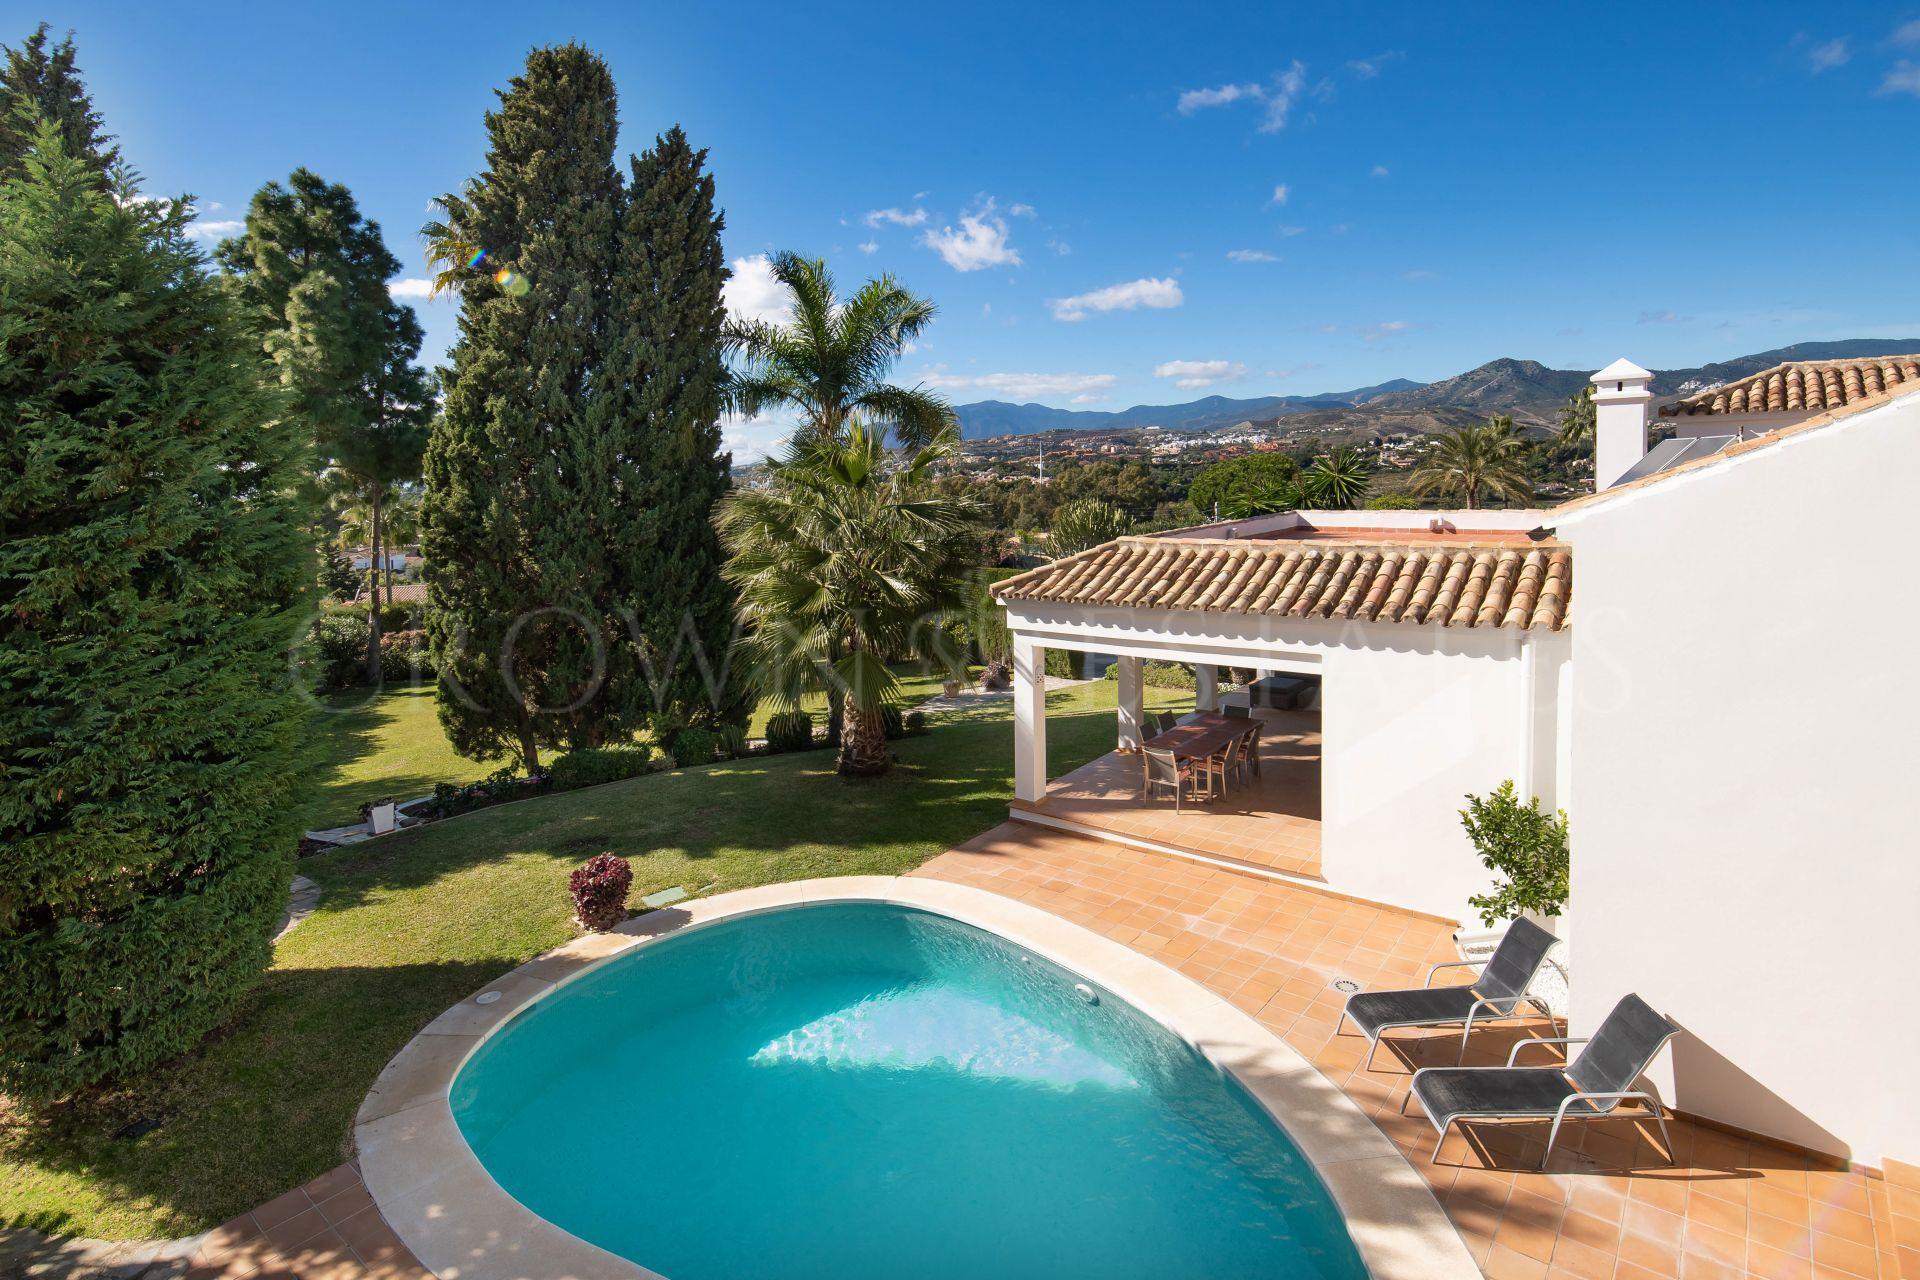 Cosy family villa in excellent location .